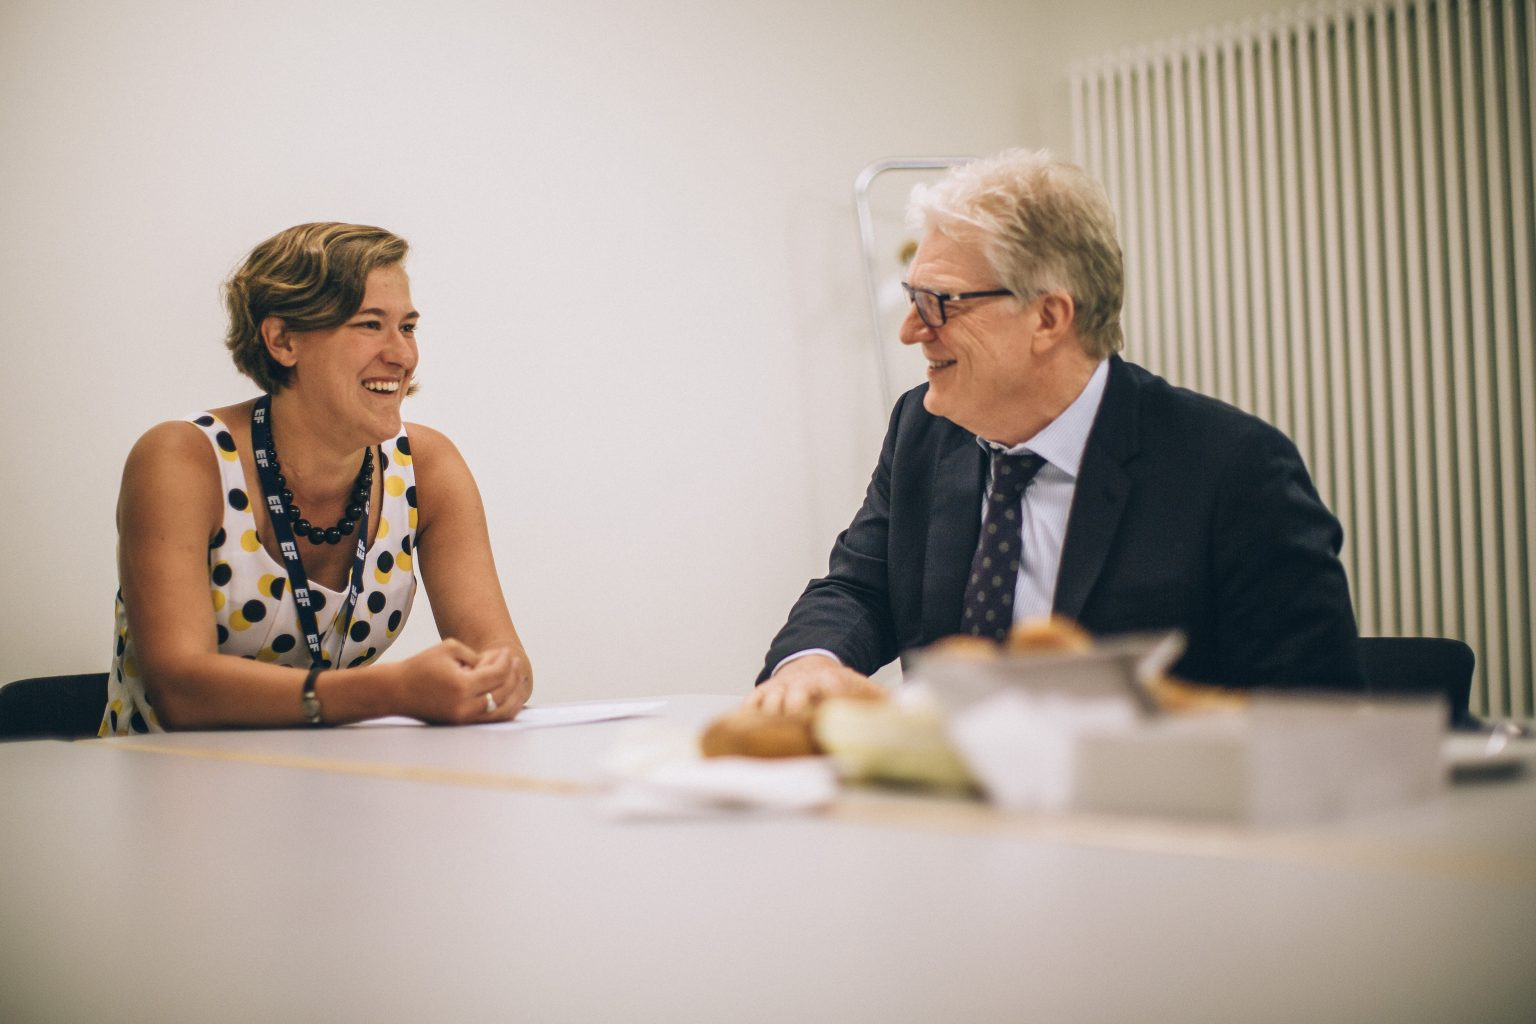 Image: Louisa with her hero, Sir Ken Robinson